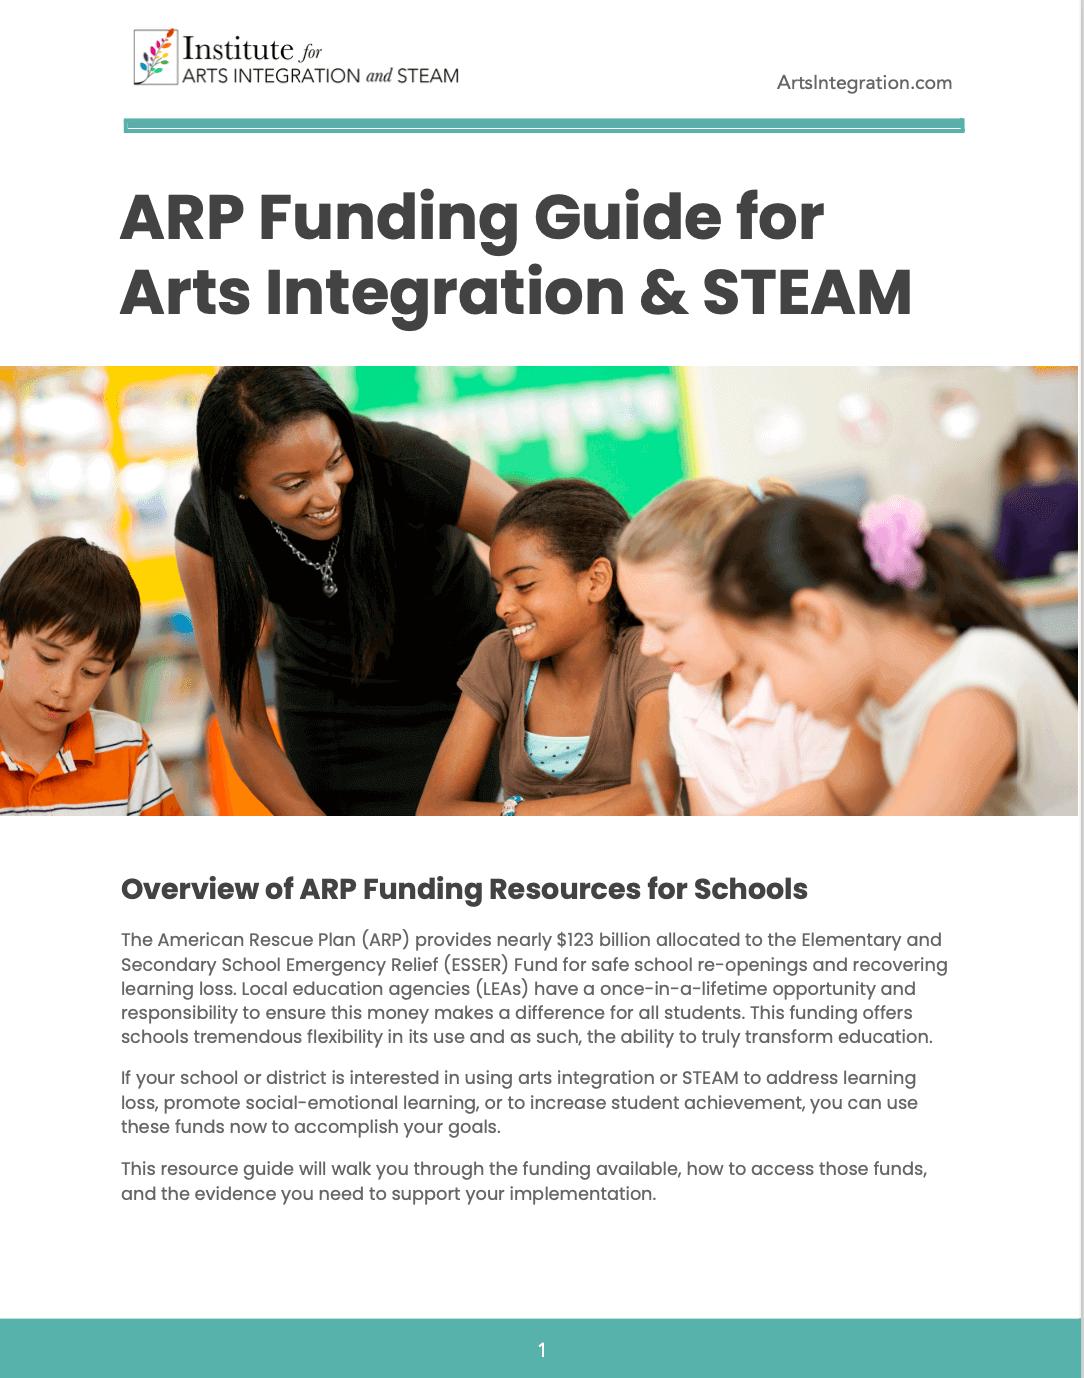 ARP funding guidebook